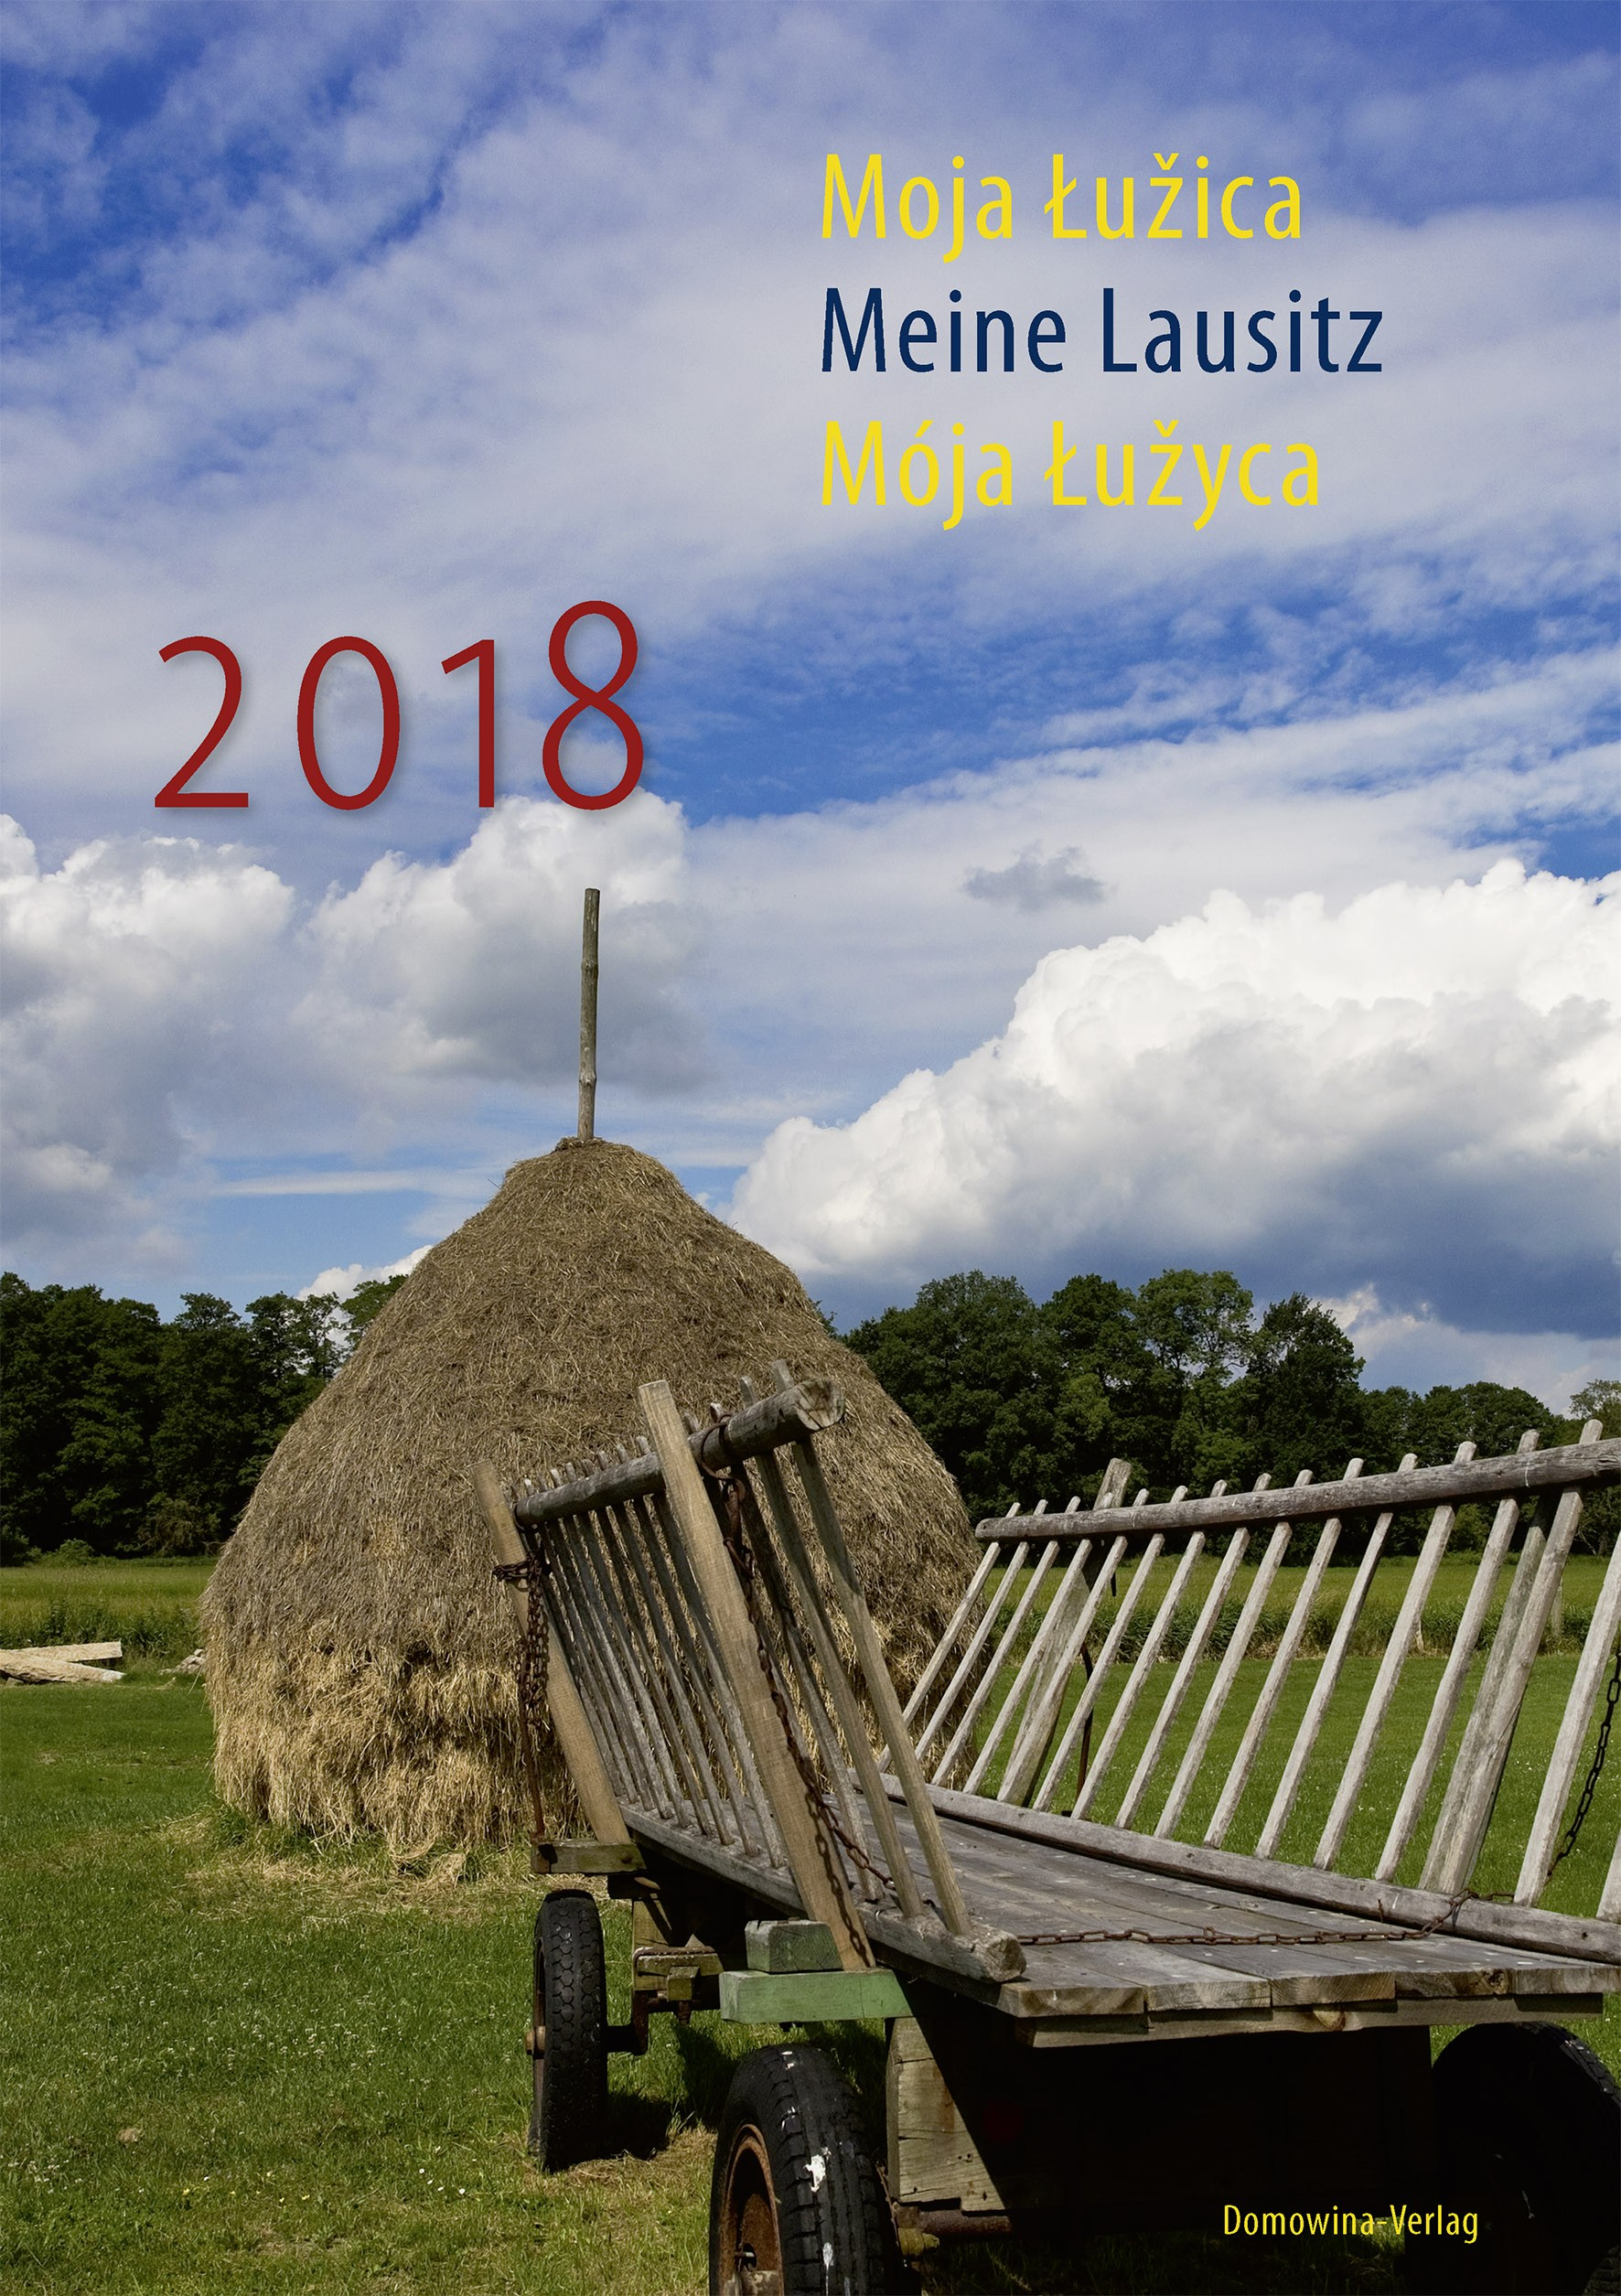 Moja Łužica – Meine Lausitz – Mója Łužyca 2018